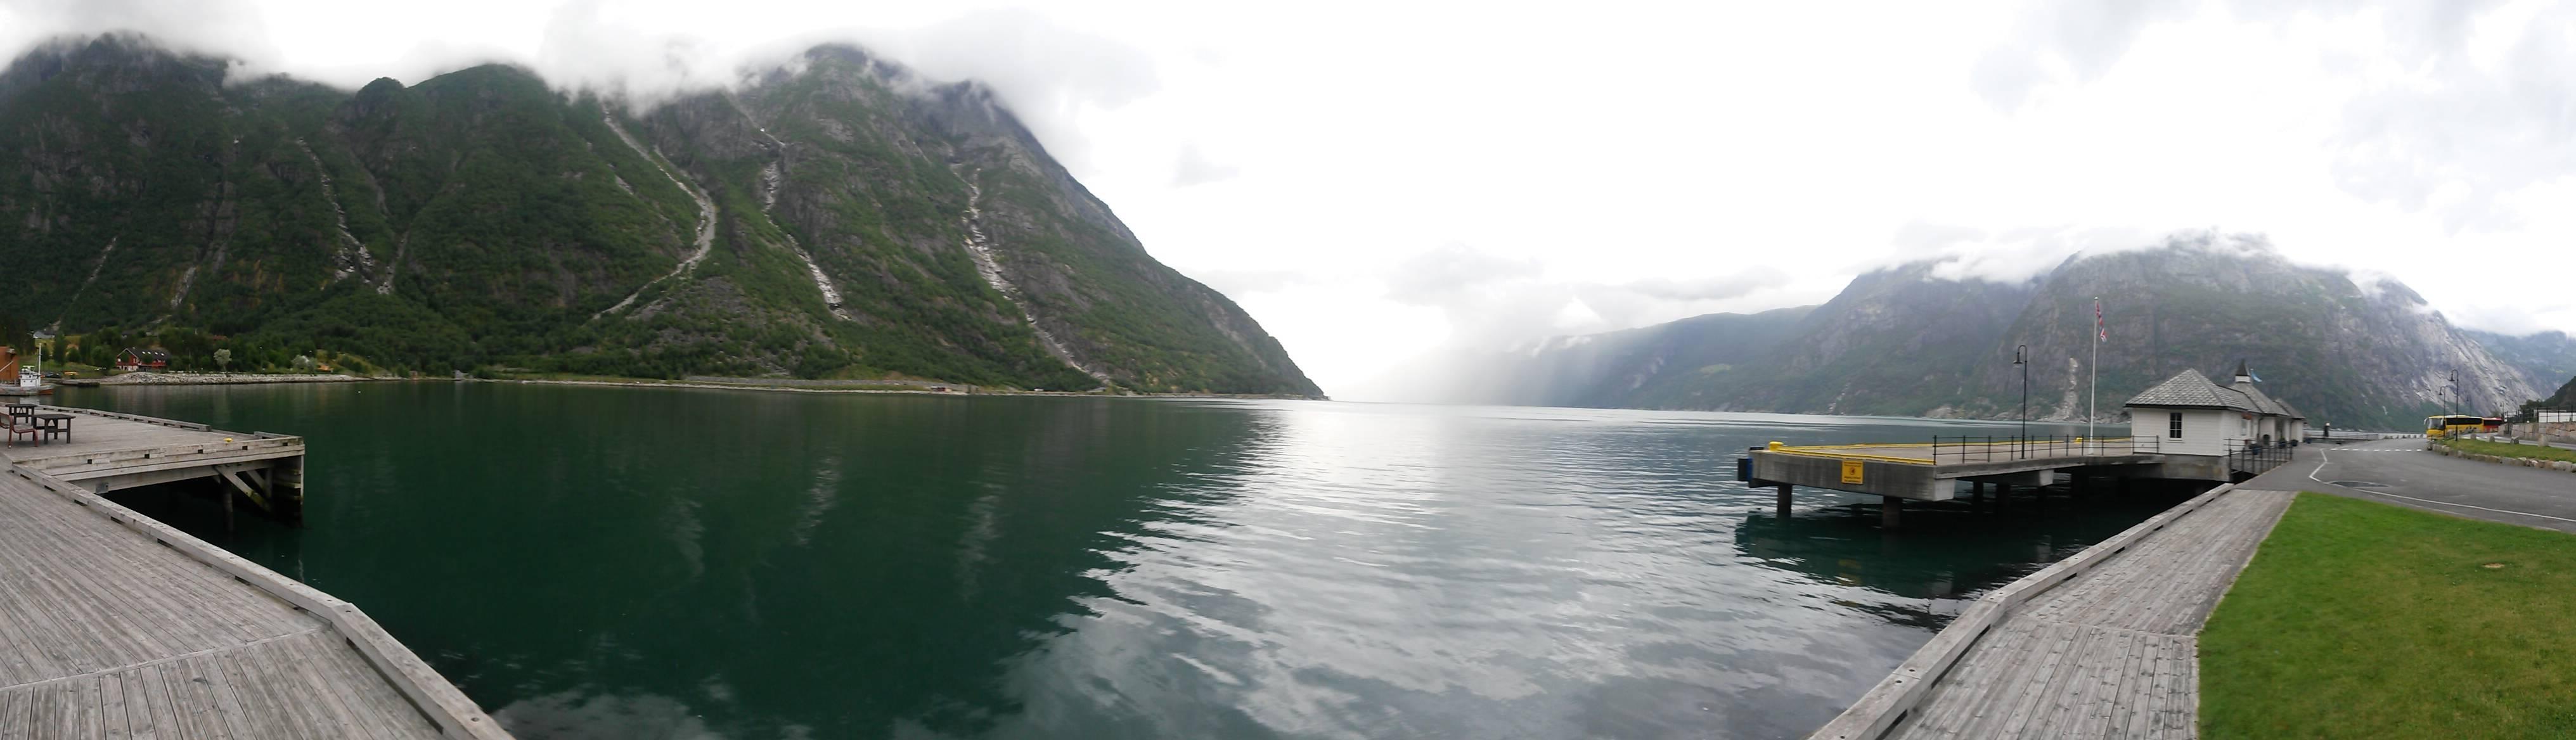 Photo 2: Escale à Eidfjord